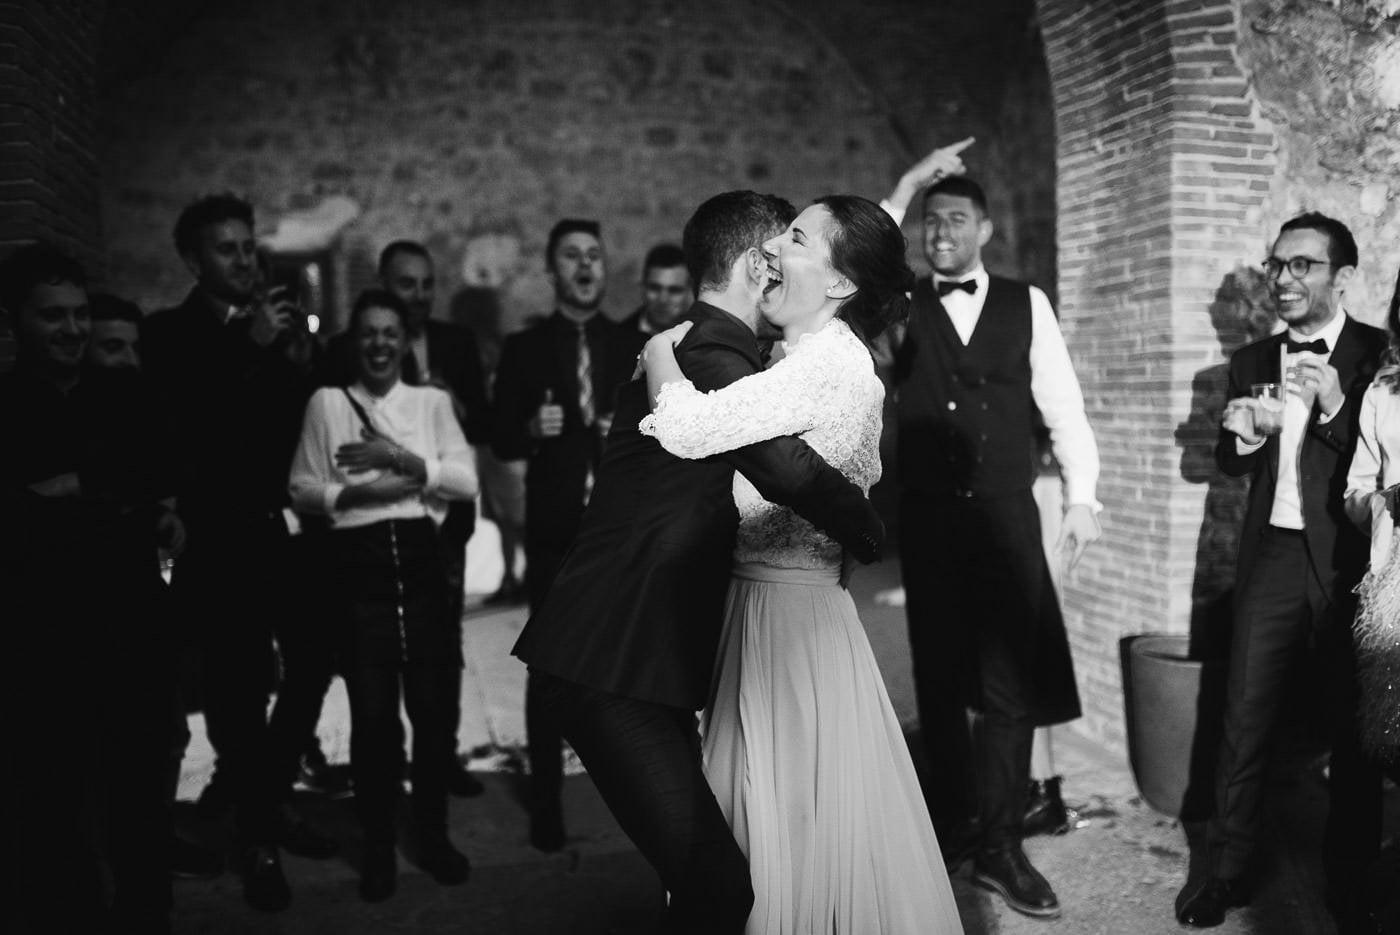 Matrimonio Giulia & Alessandro 28_12 – Alessio Nobili Photographer-75